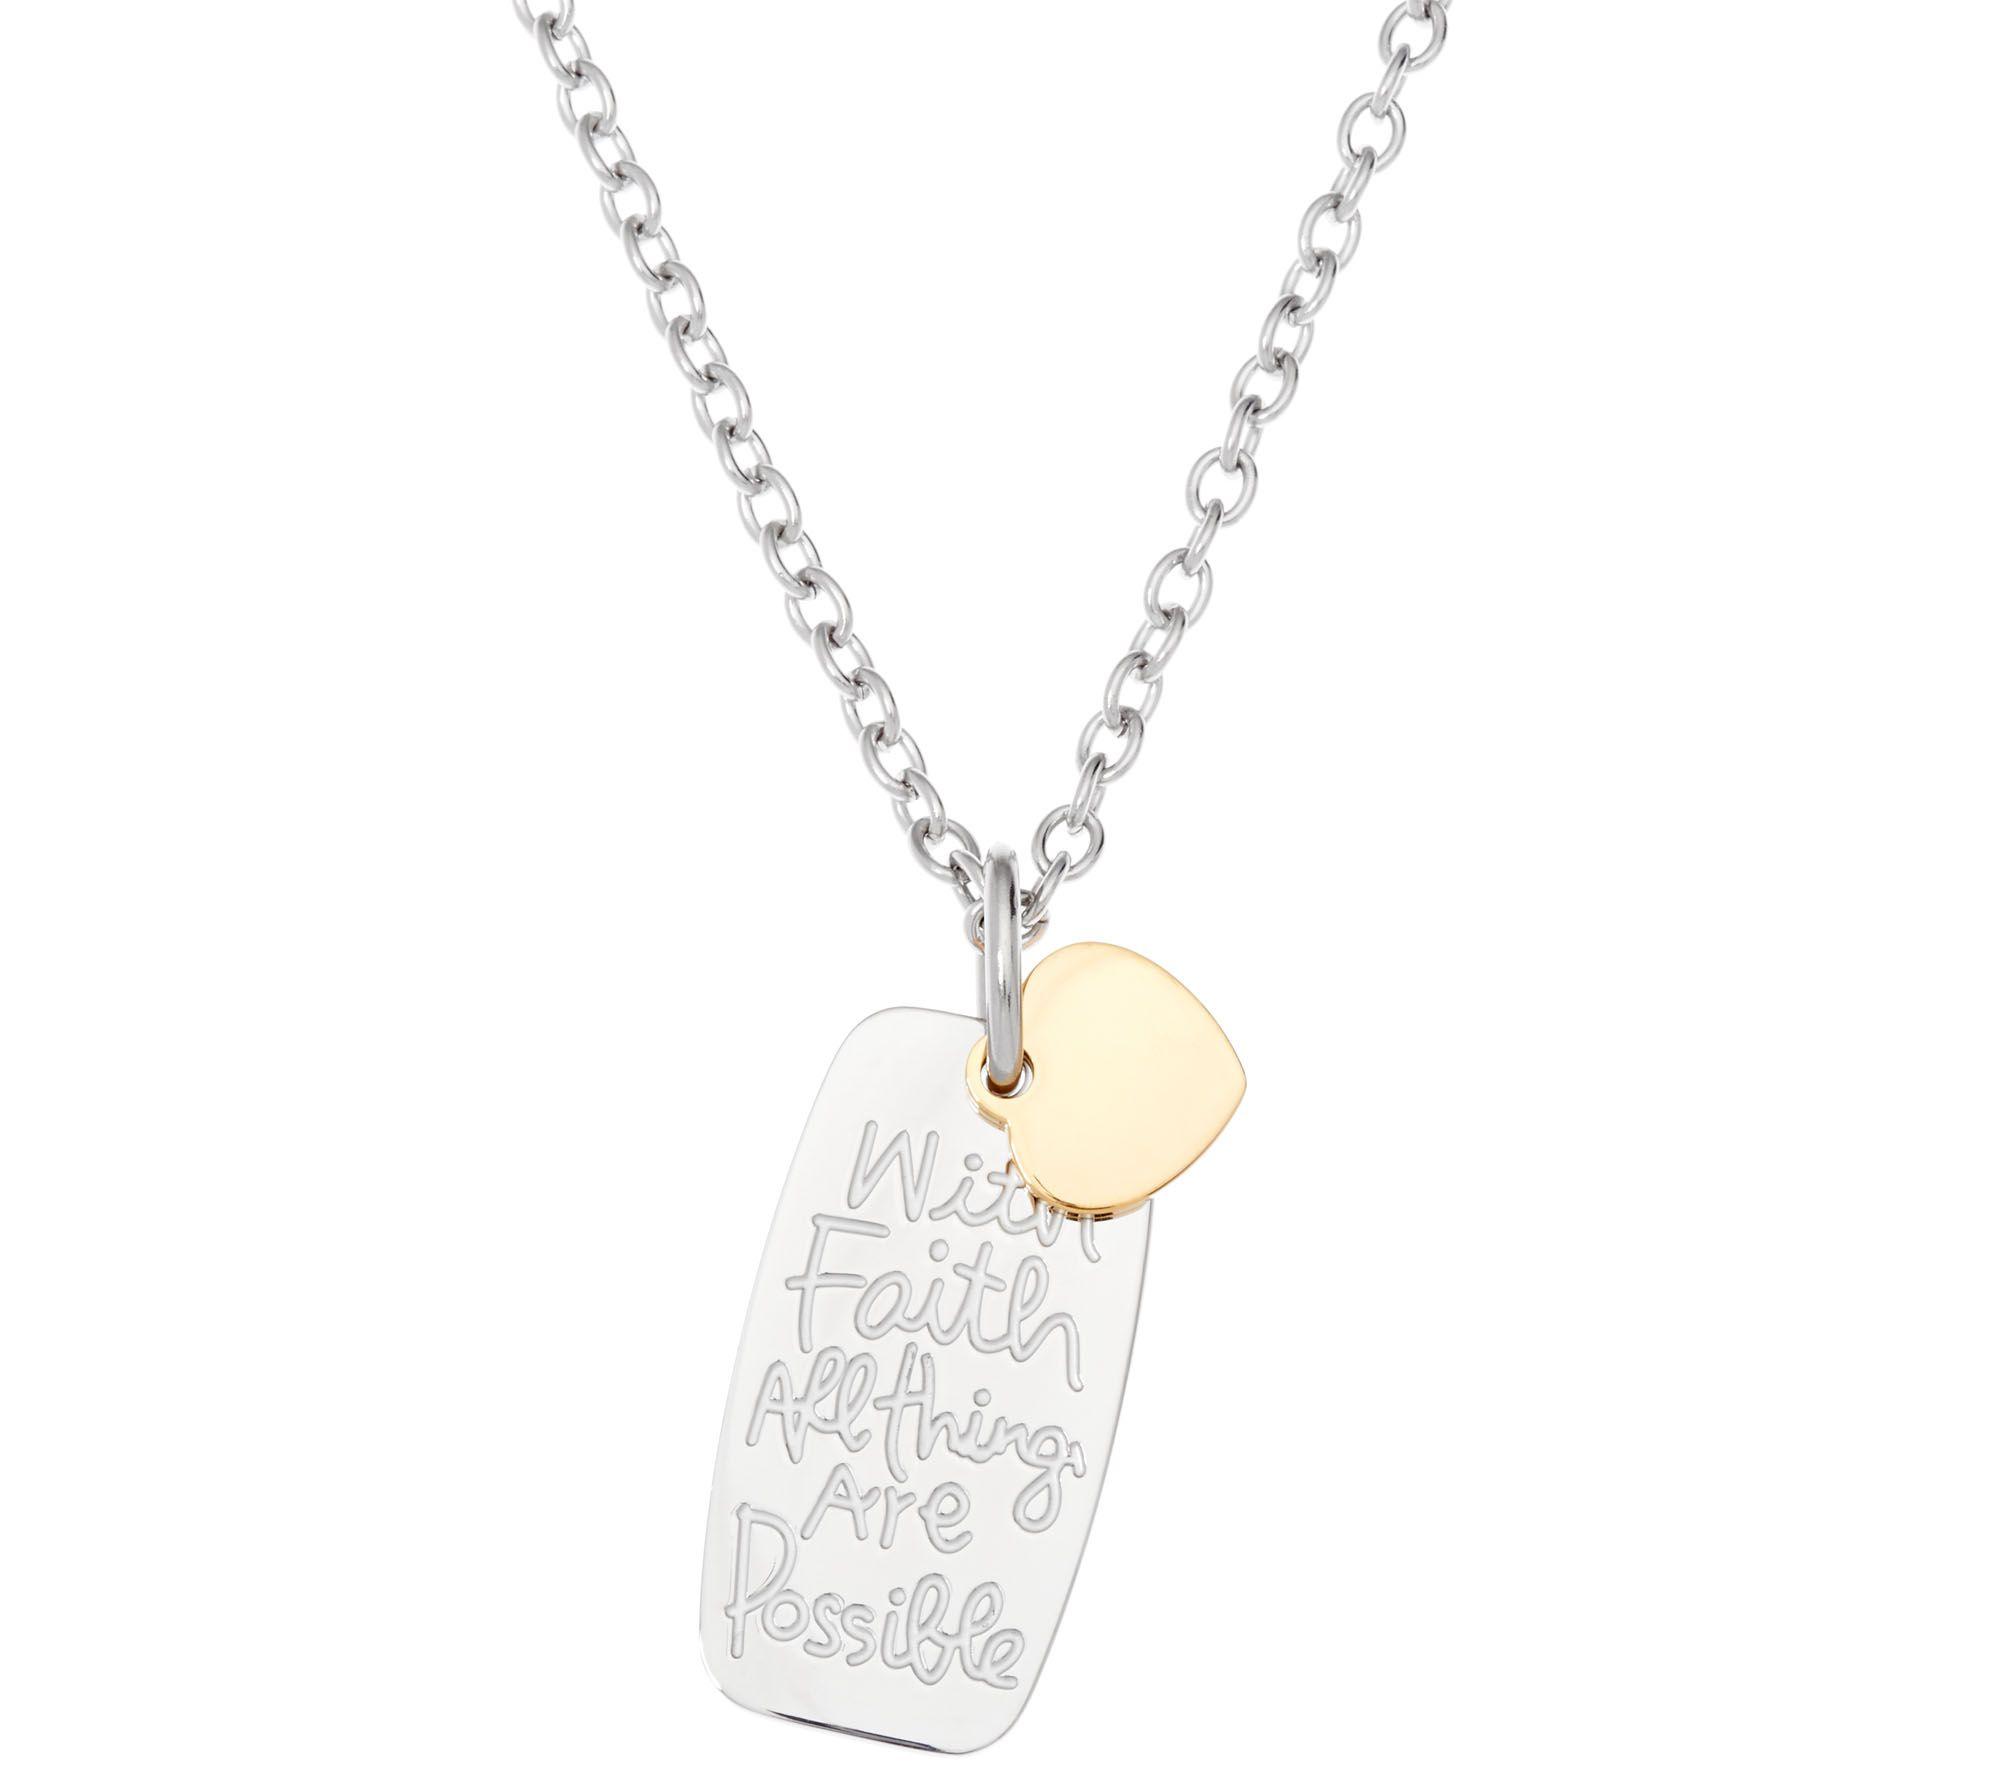 New Stainless Steel Zodiac Dog Tag Pendant Men S Women S: Stainless Steel Inspirational Dog Tag Necklace